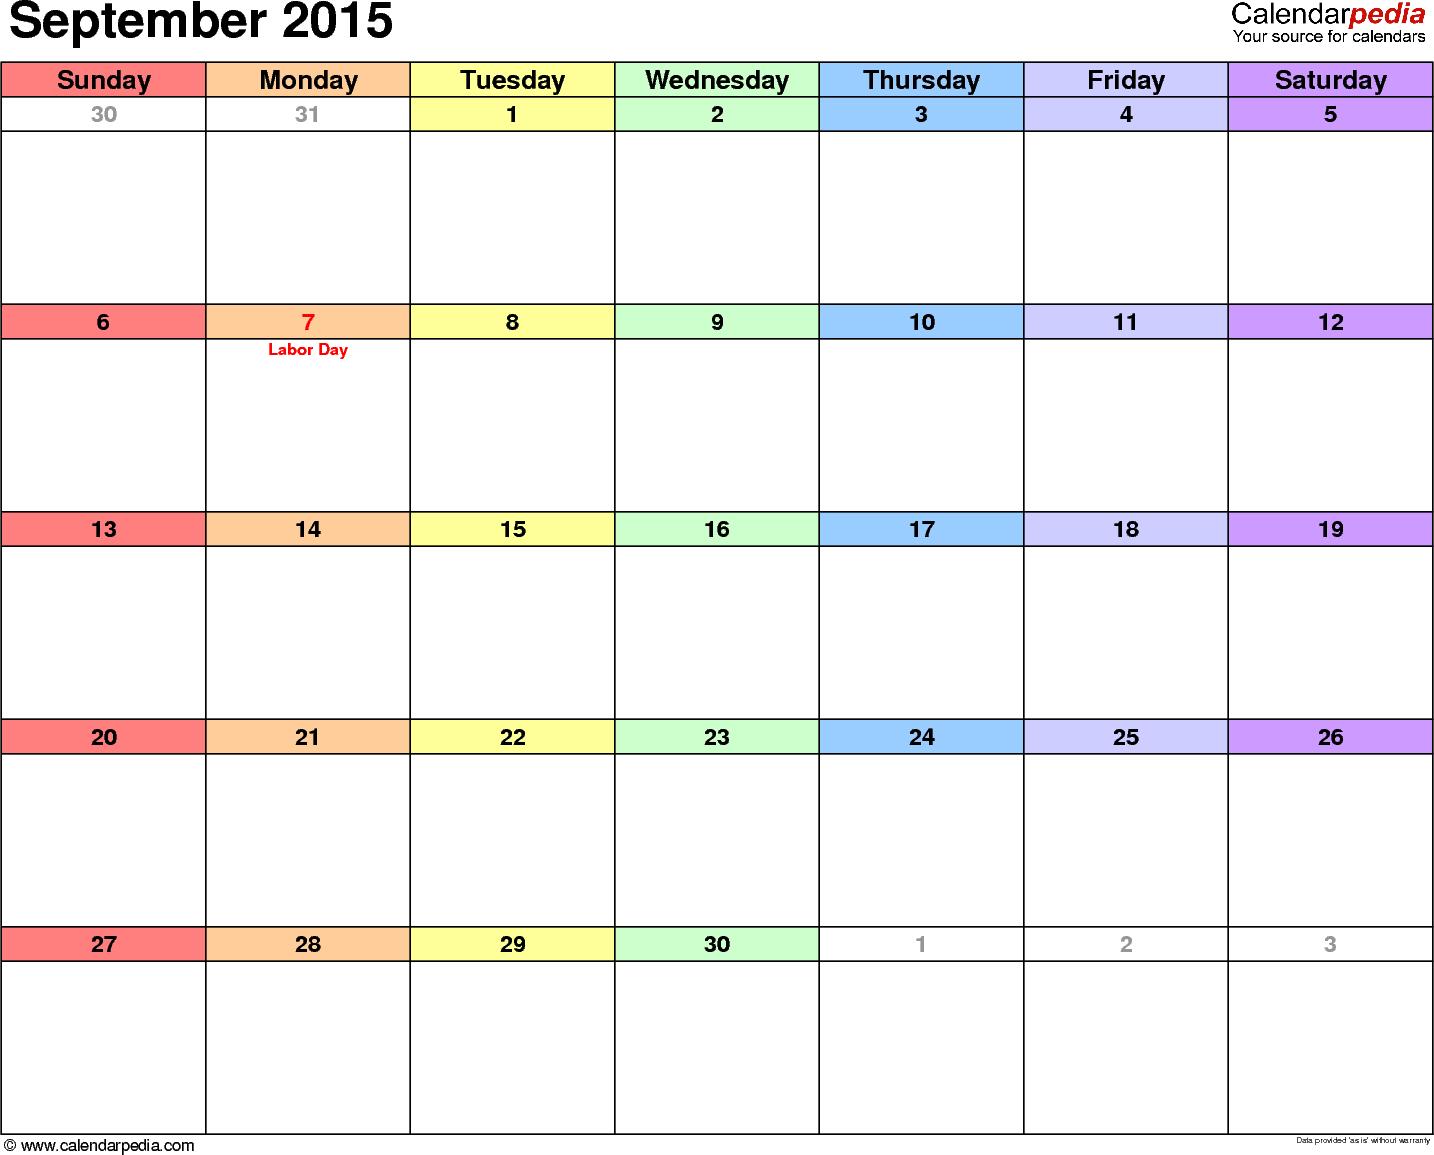 September 2015 calendar, landscape orientation, 'rainbow calendar', available as printable templates for Word, Excel and PDF